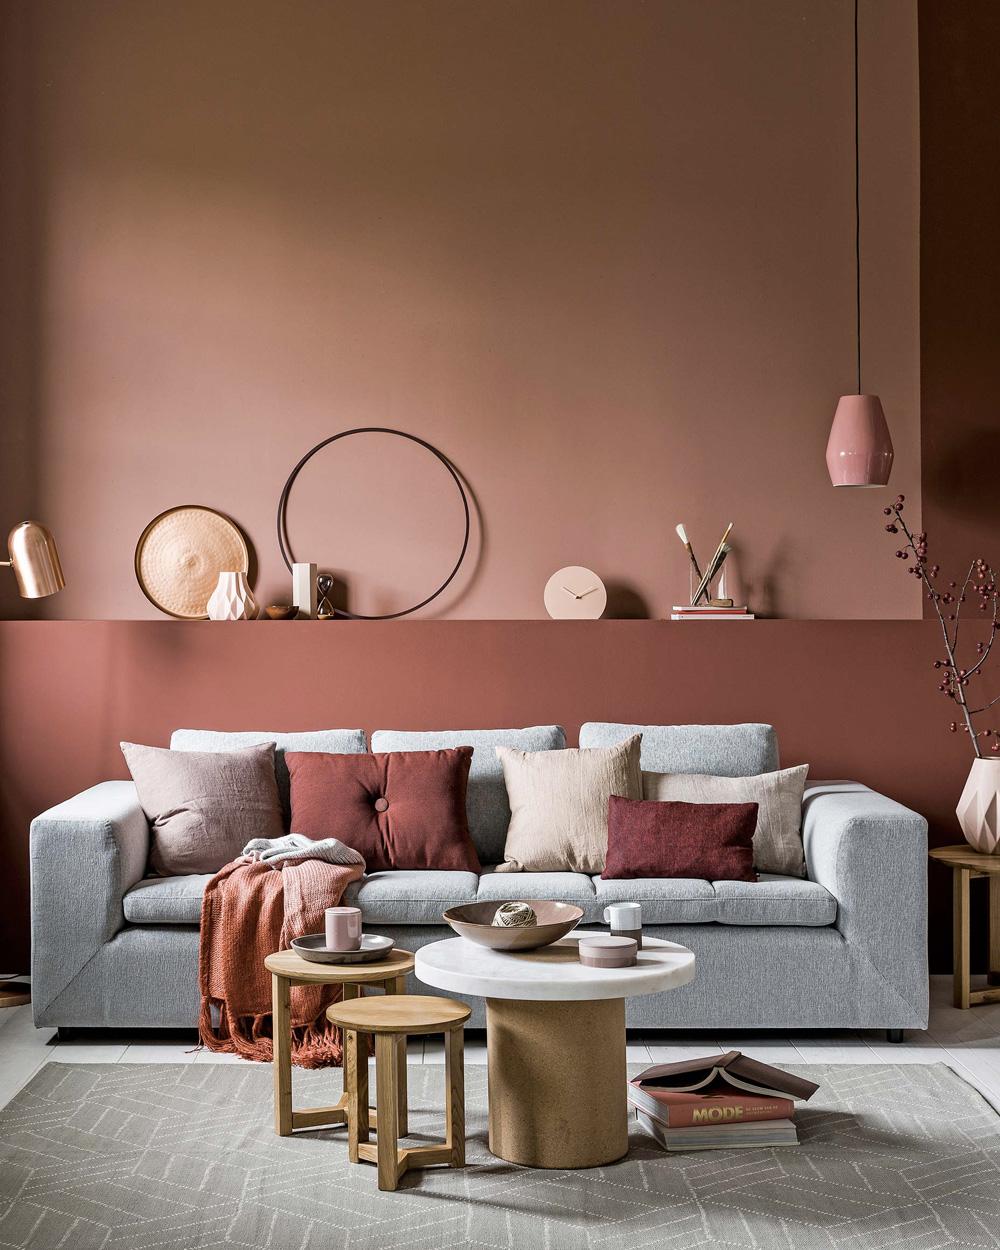 deco orange violet rose salon